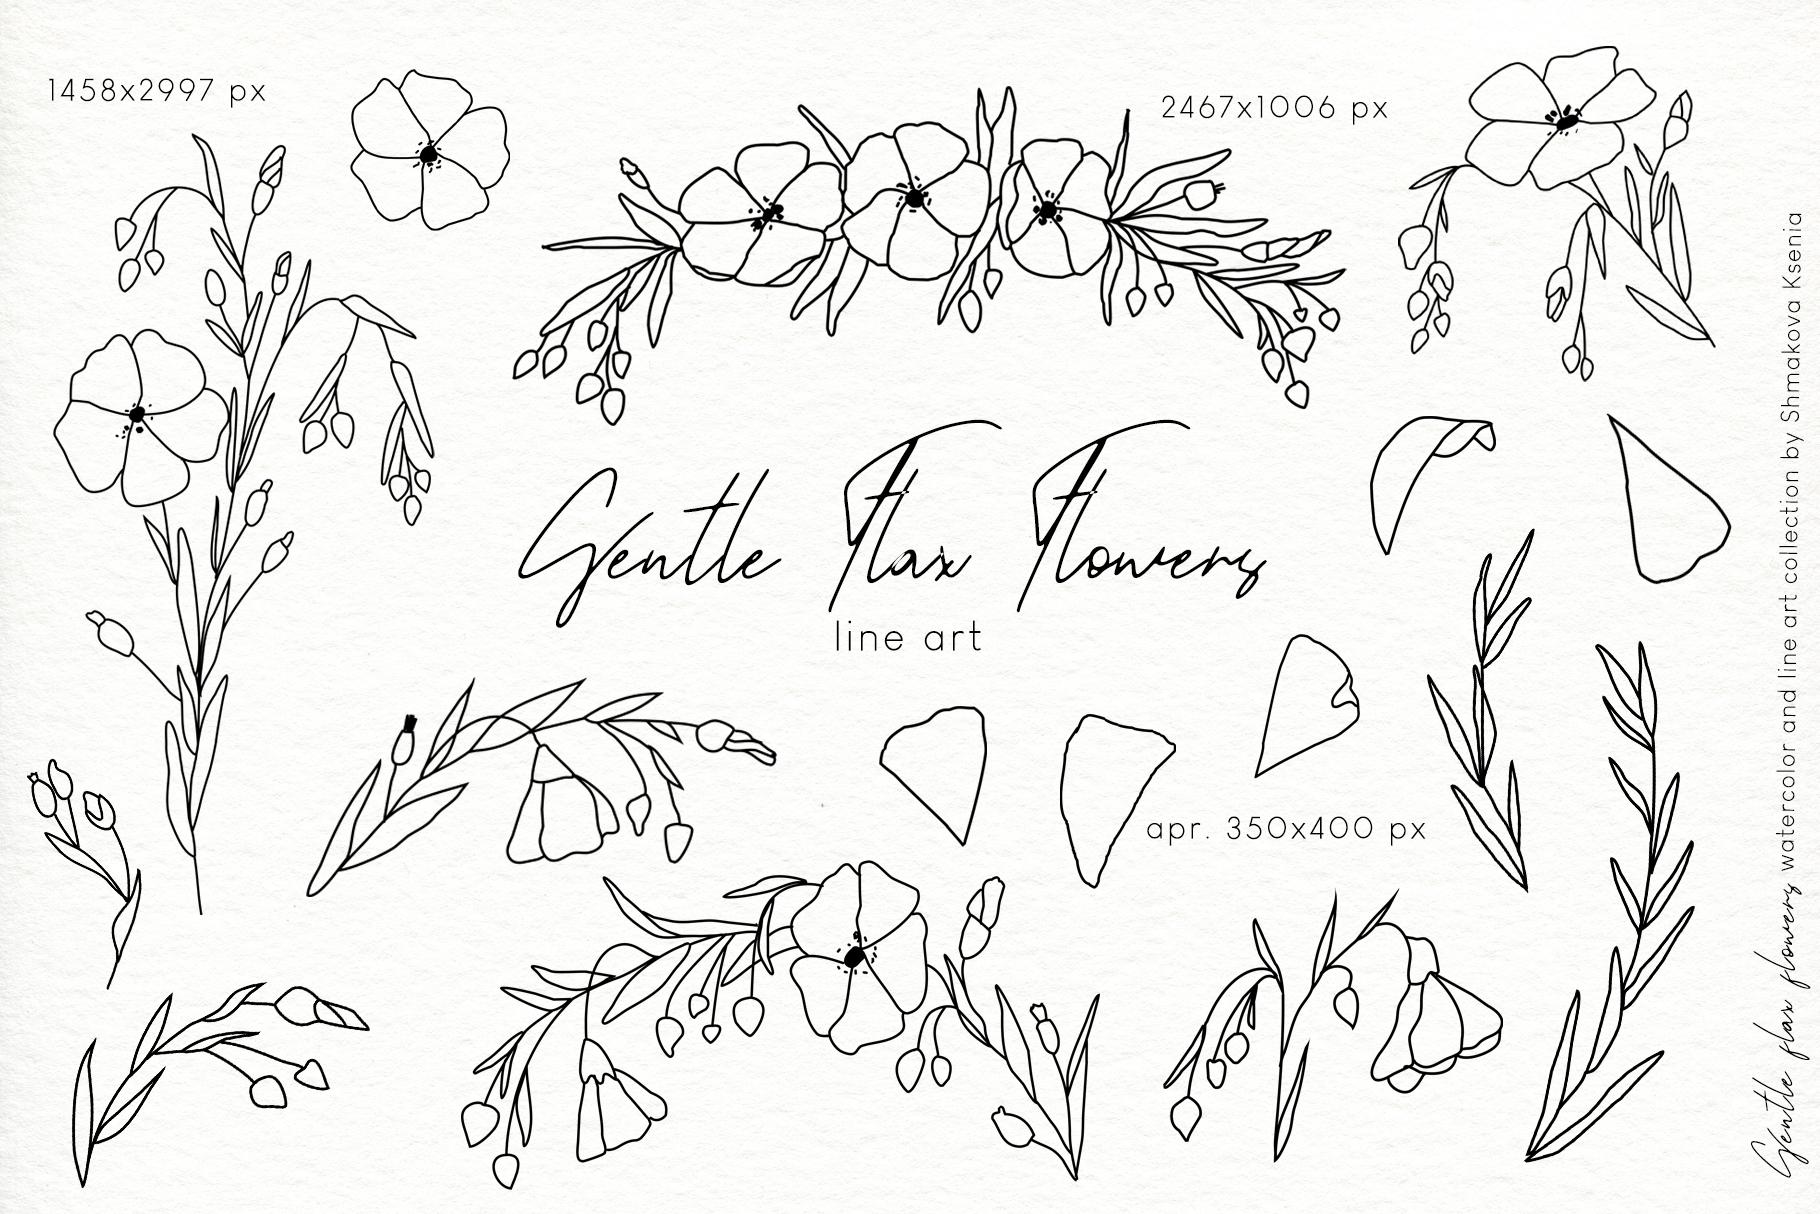 Gentle Flax Flowers example image 8